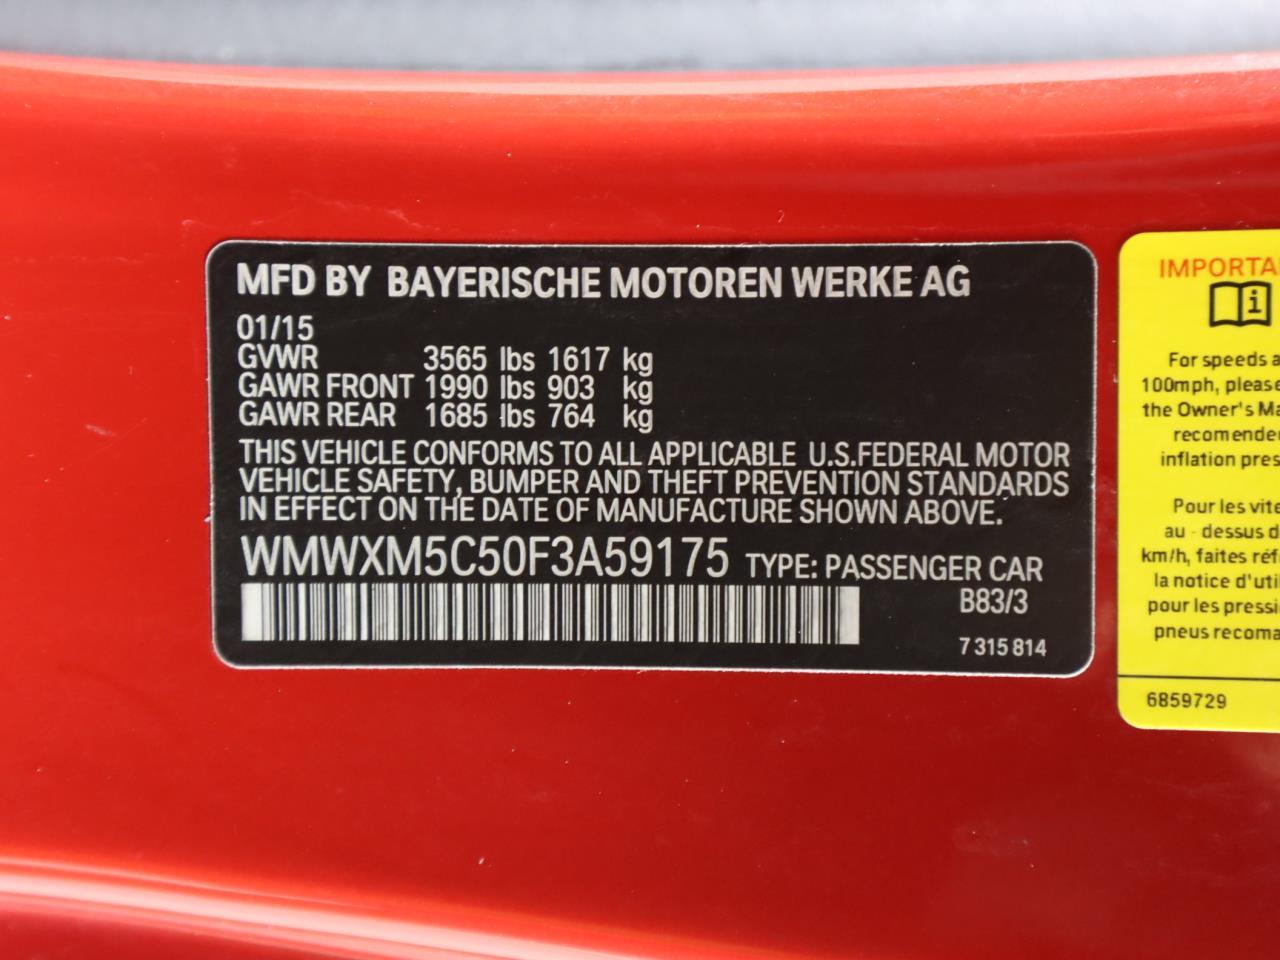 used vehicle - Coupe MINI COOPER HARDTOP 2015